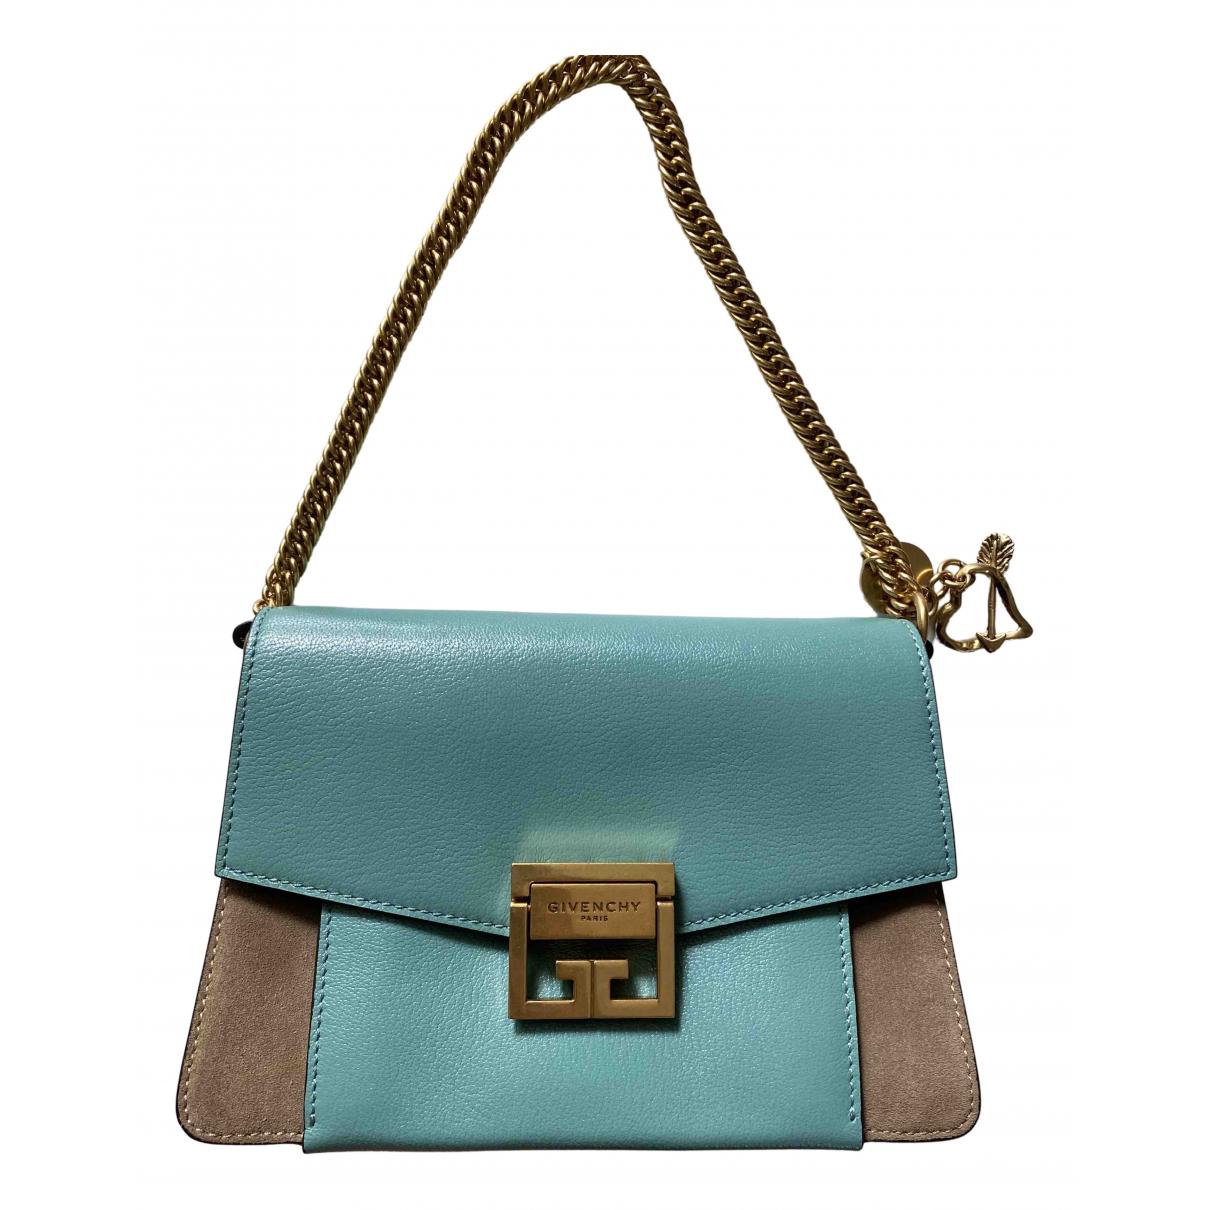 Givenchy - Sac a main GV3 pour femme en cuir - bleu